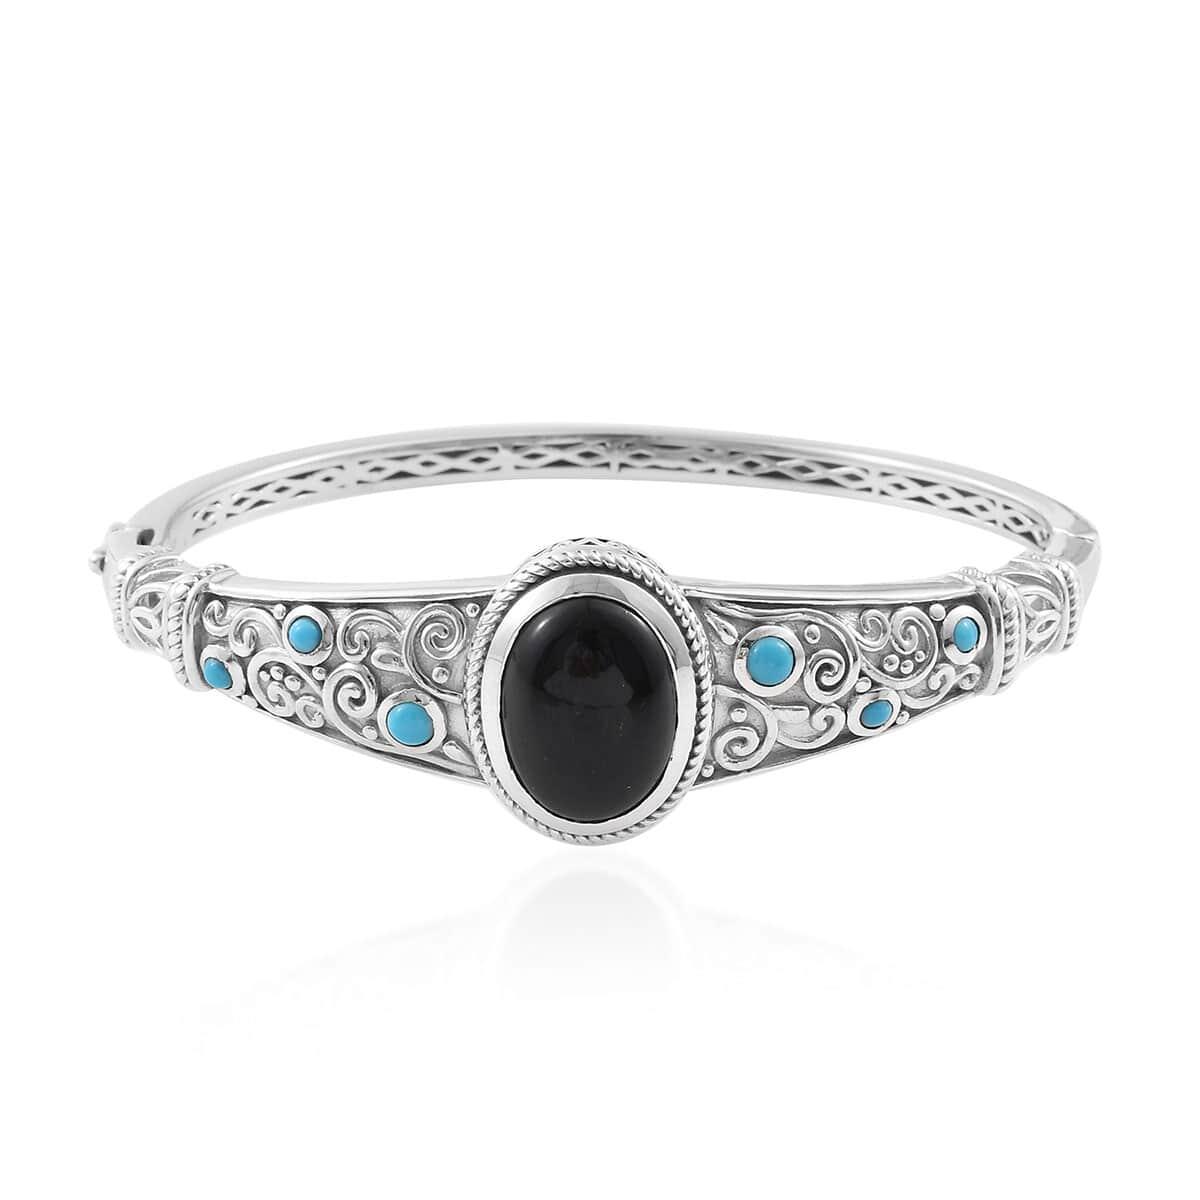 Bangle Bracelet Silver Black Jade Sleeping Beauty